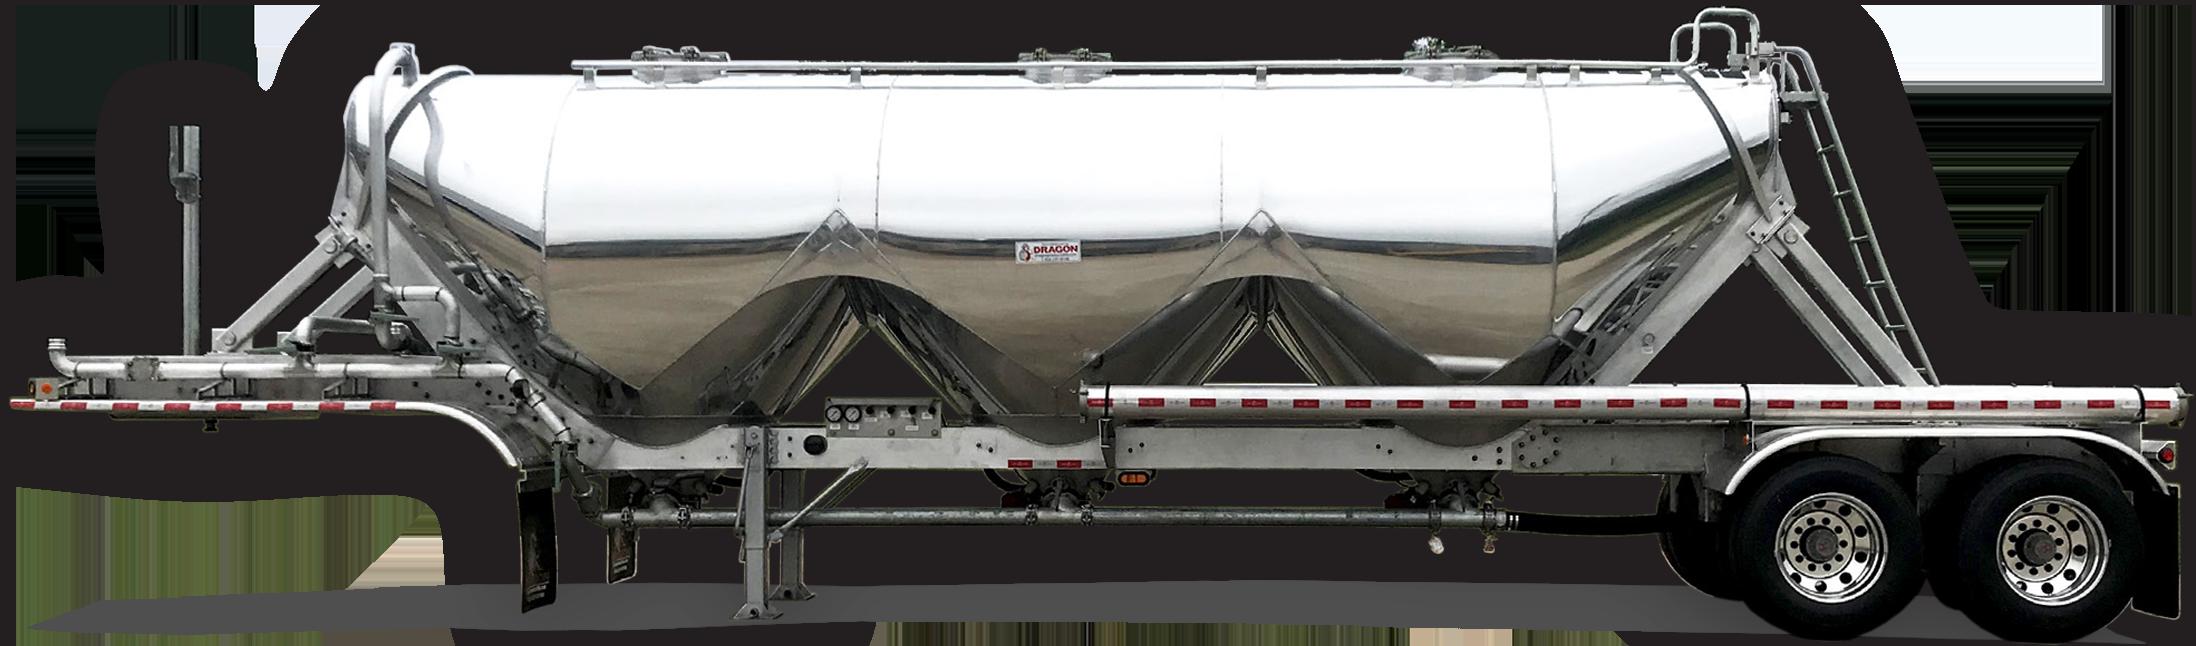 Ranco Vantage P42-1050 Aluminum Pneumatic